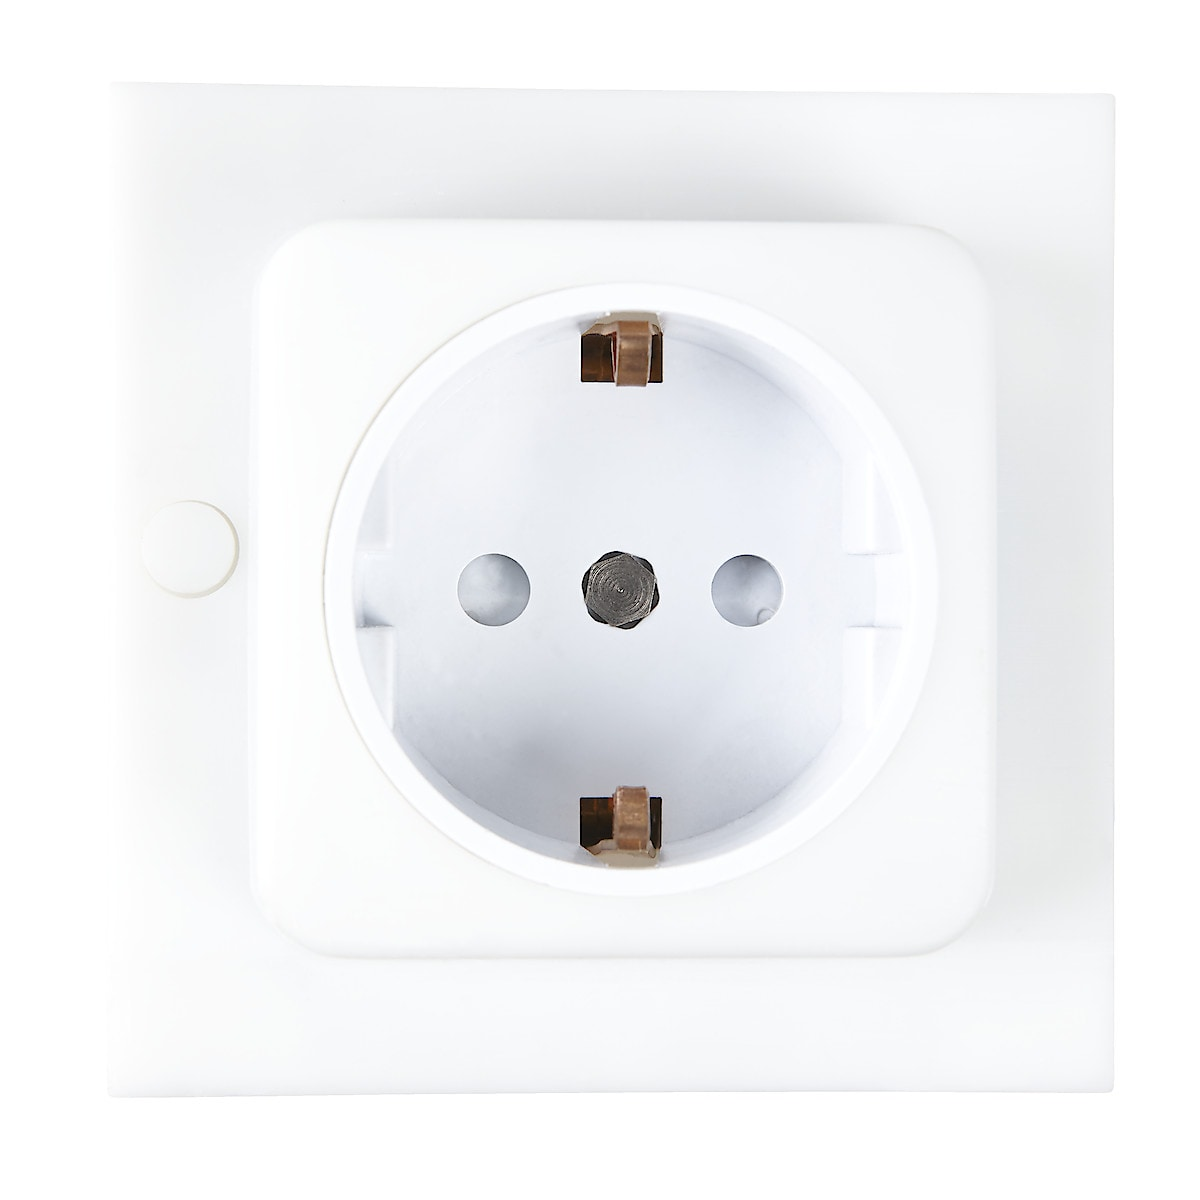 Cotech Smart Home fjernstyrt strømuttak